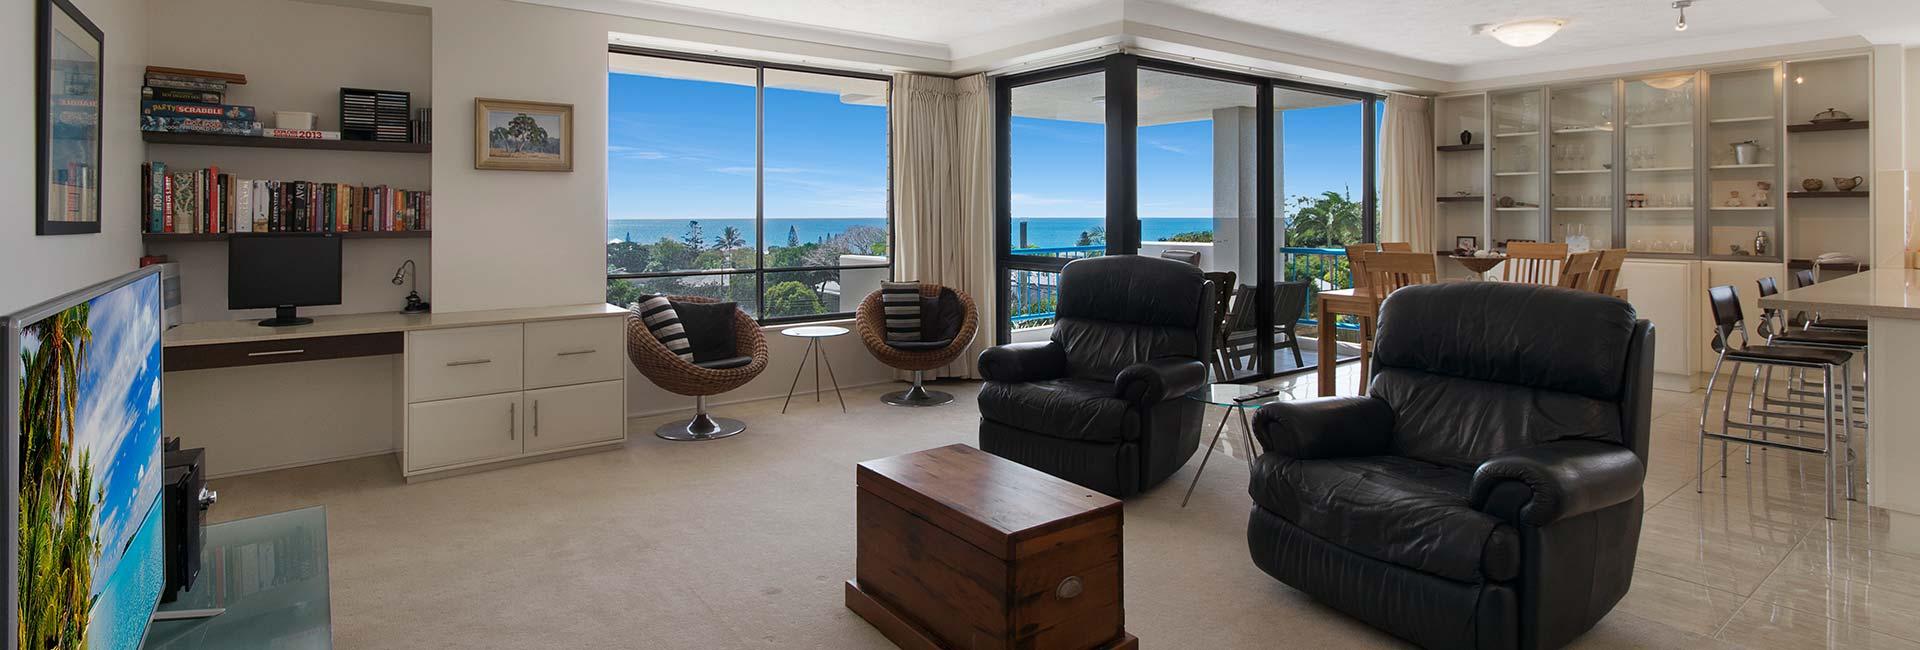 Caloundra holiday apartments